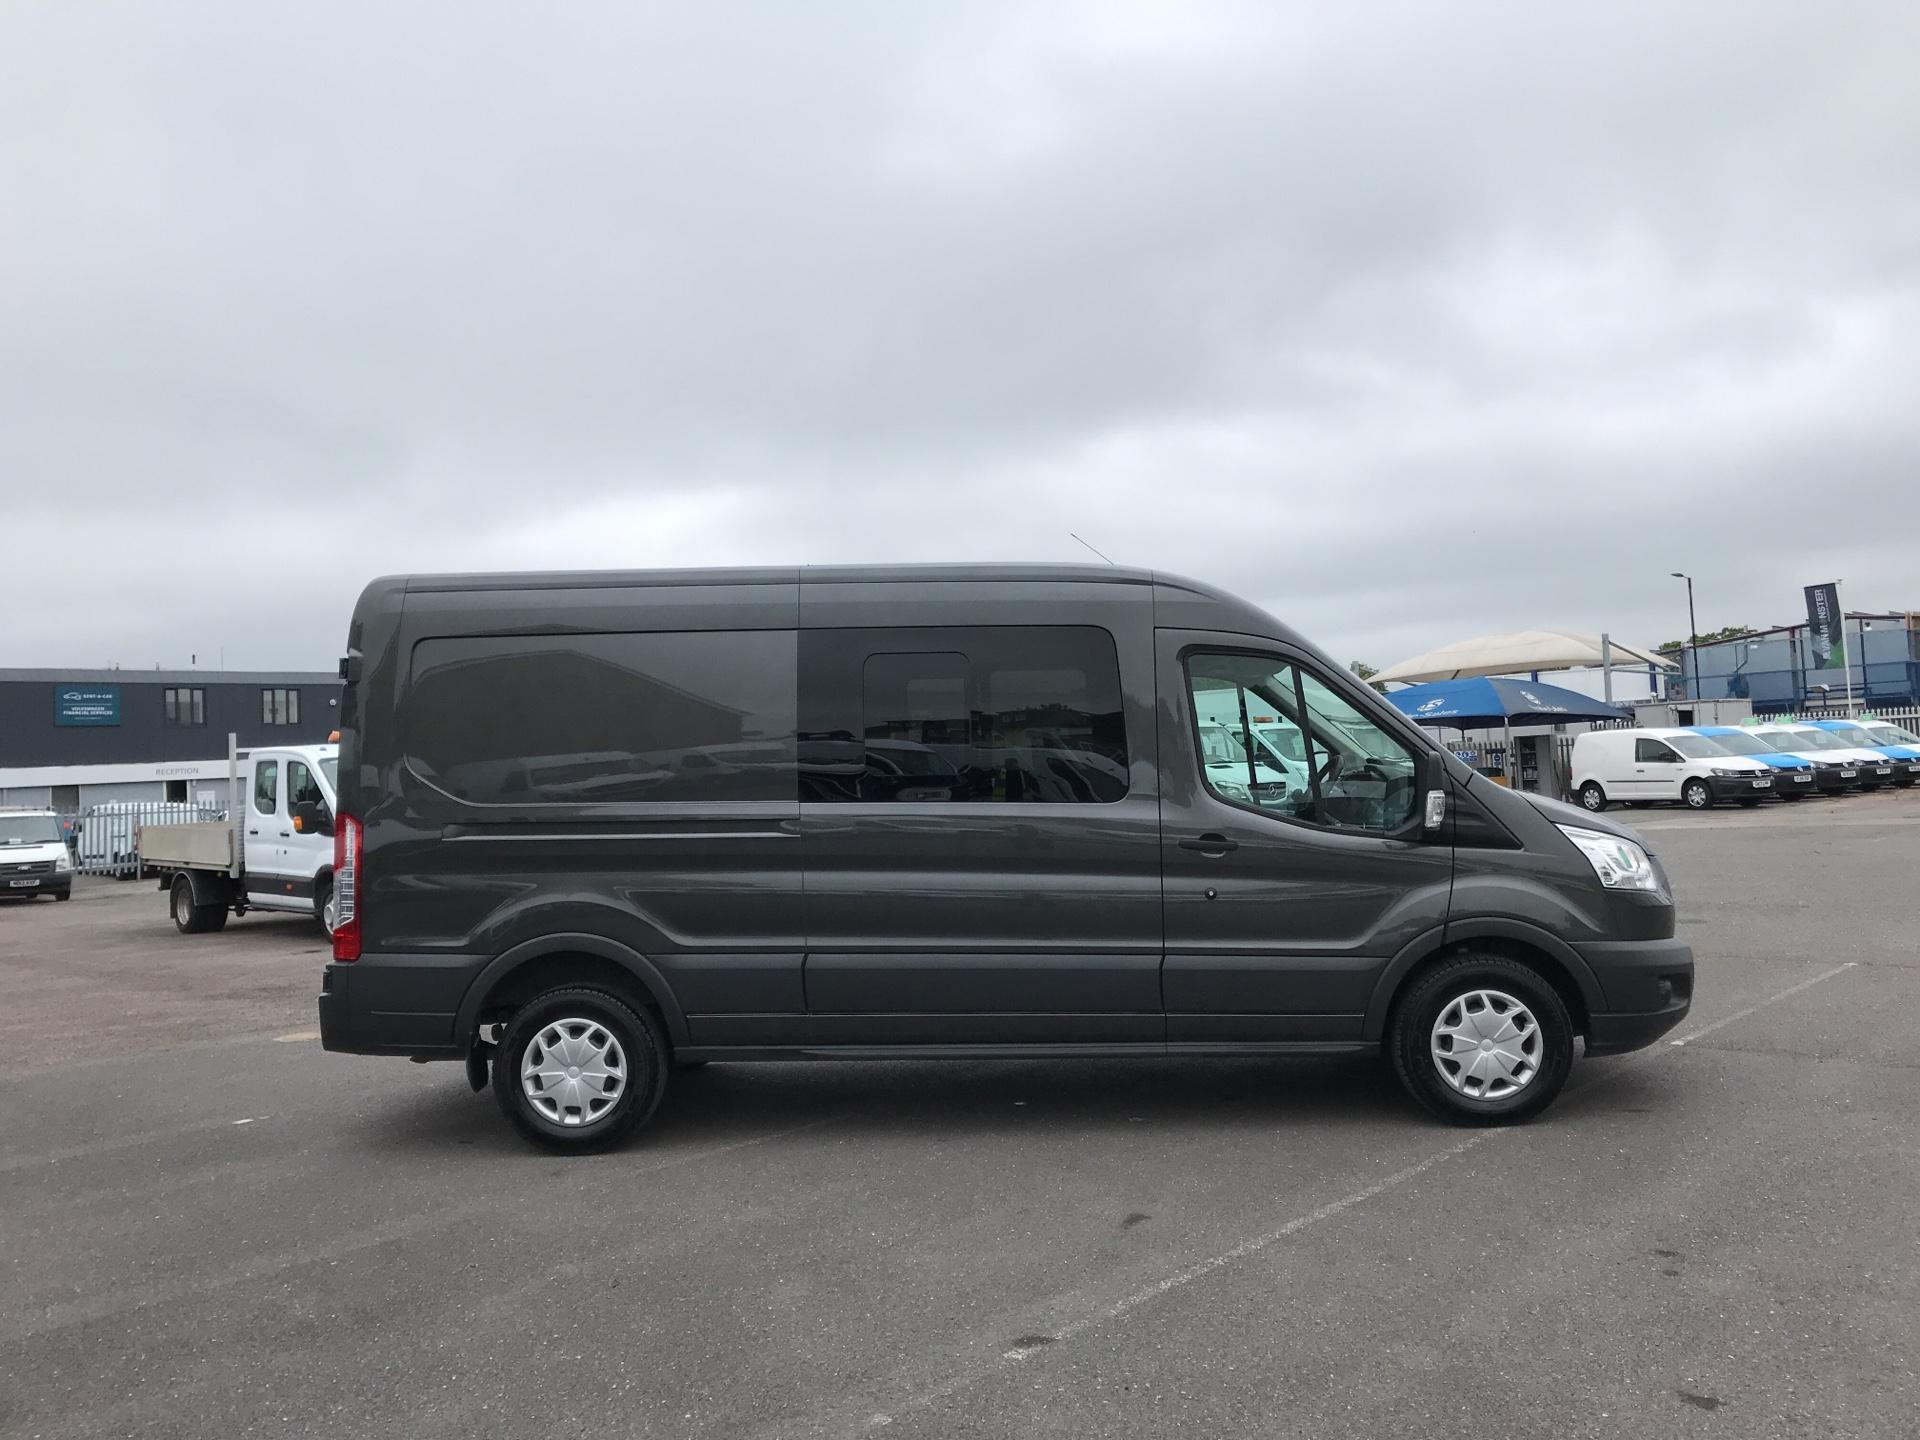 2018 Ford Transit 2.0 Tdci 130Ps H2 D/Cab Van EURO 6 (AO68SXU) Image 2